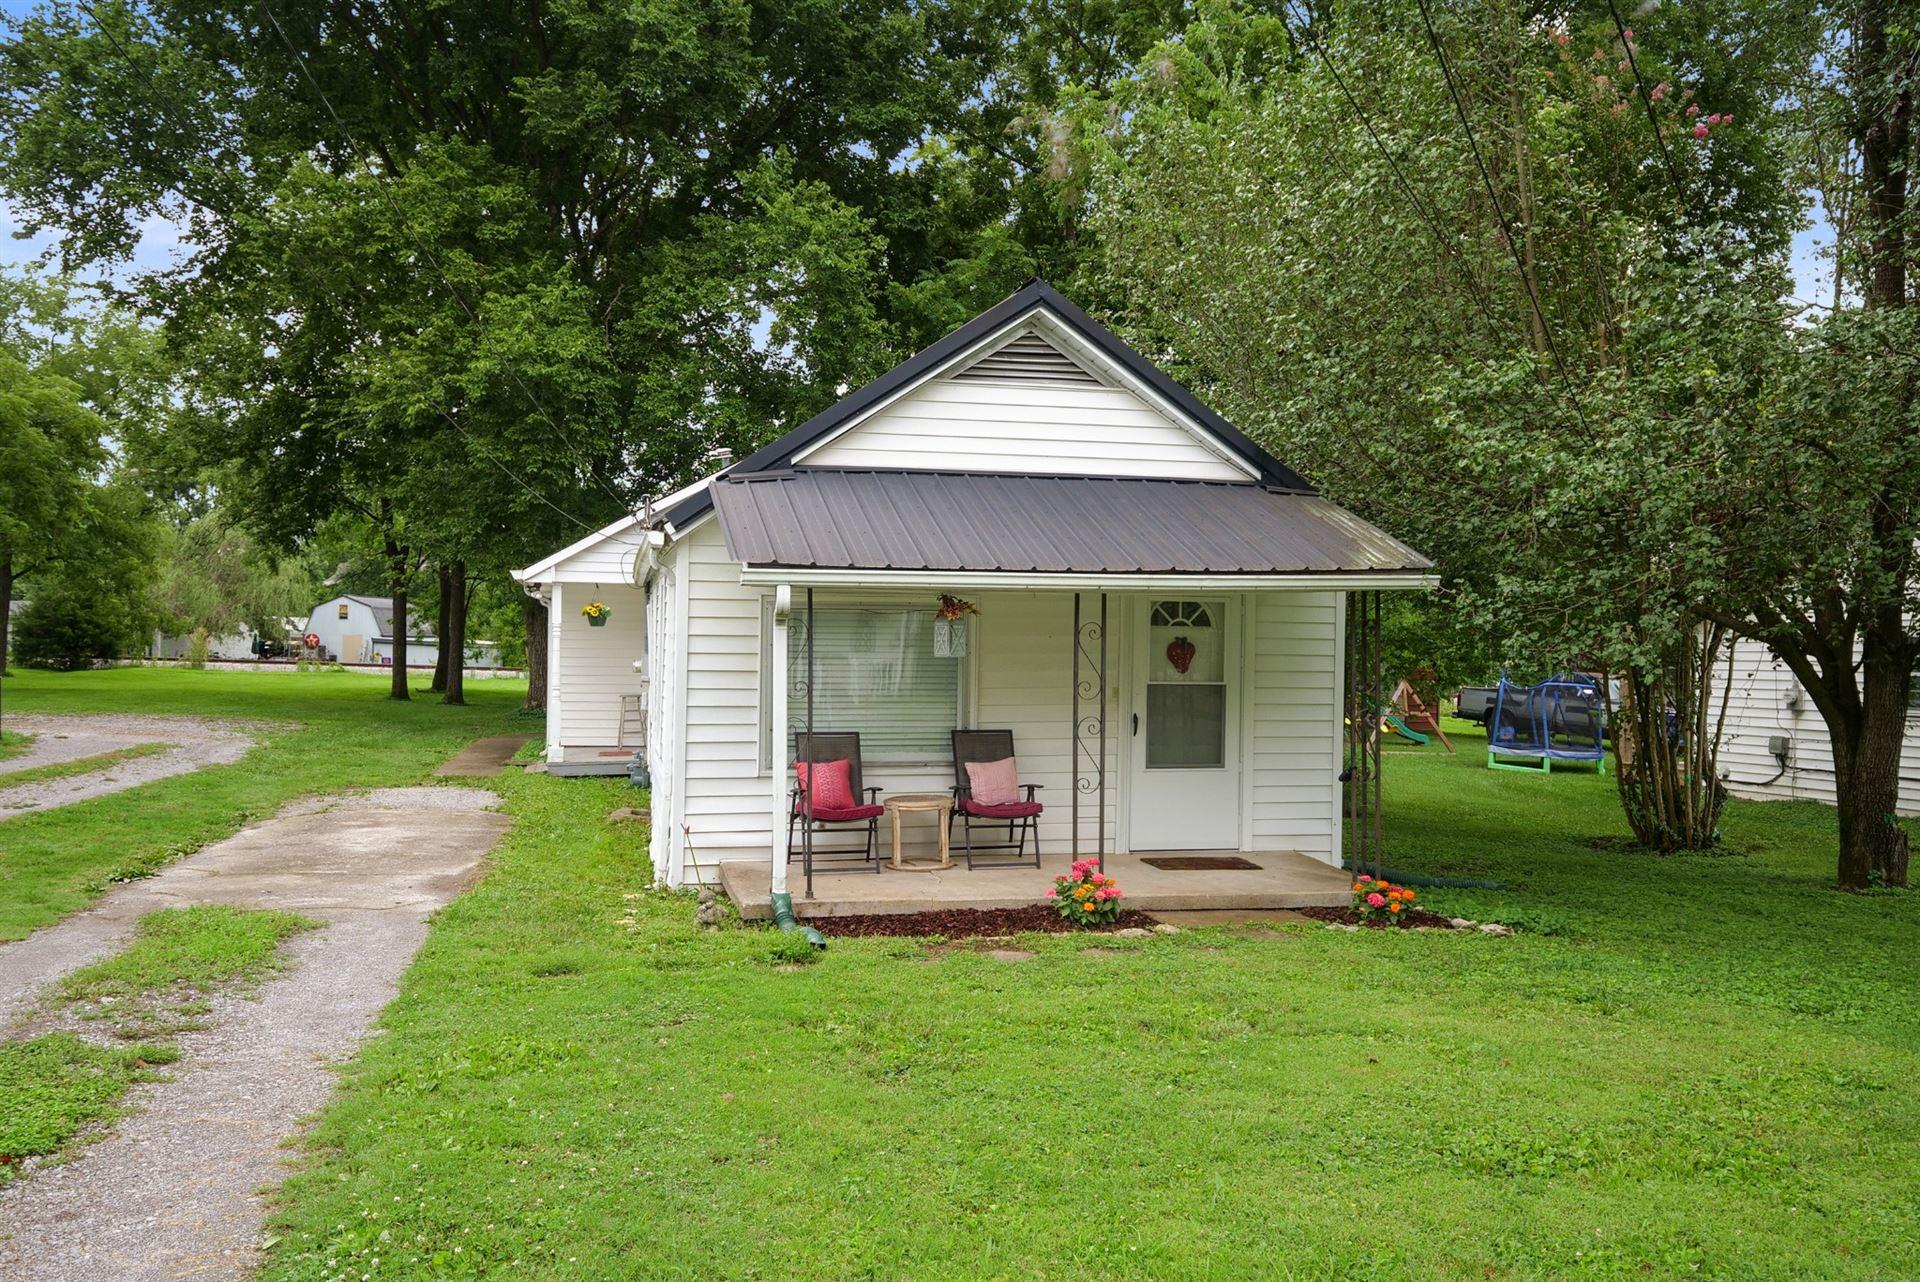 141 Church Ave, Watertown, TN 37184 - MLS#: 2272706